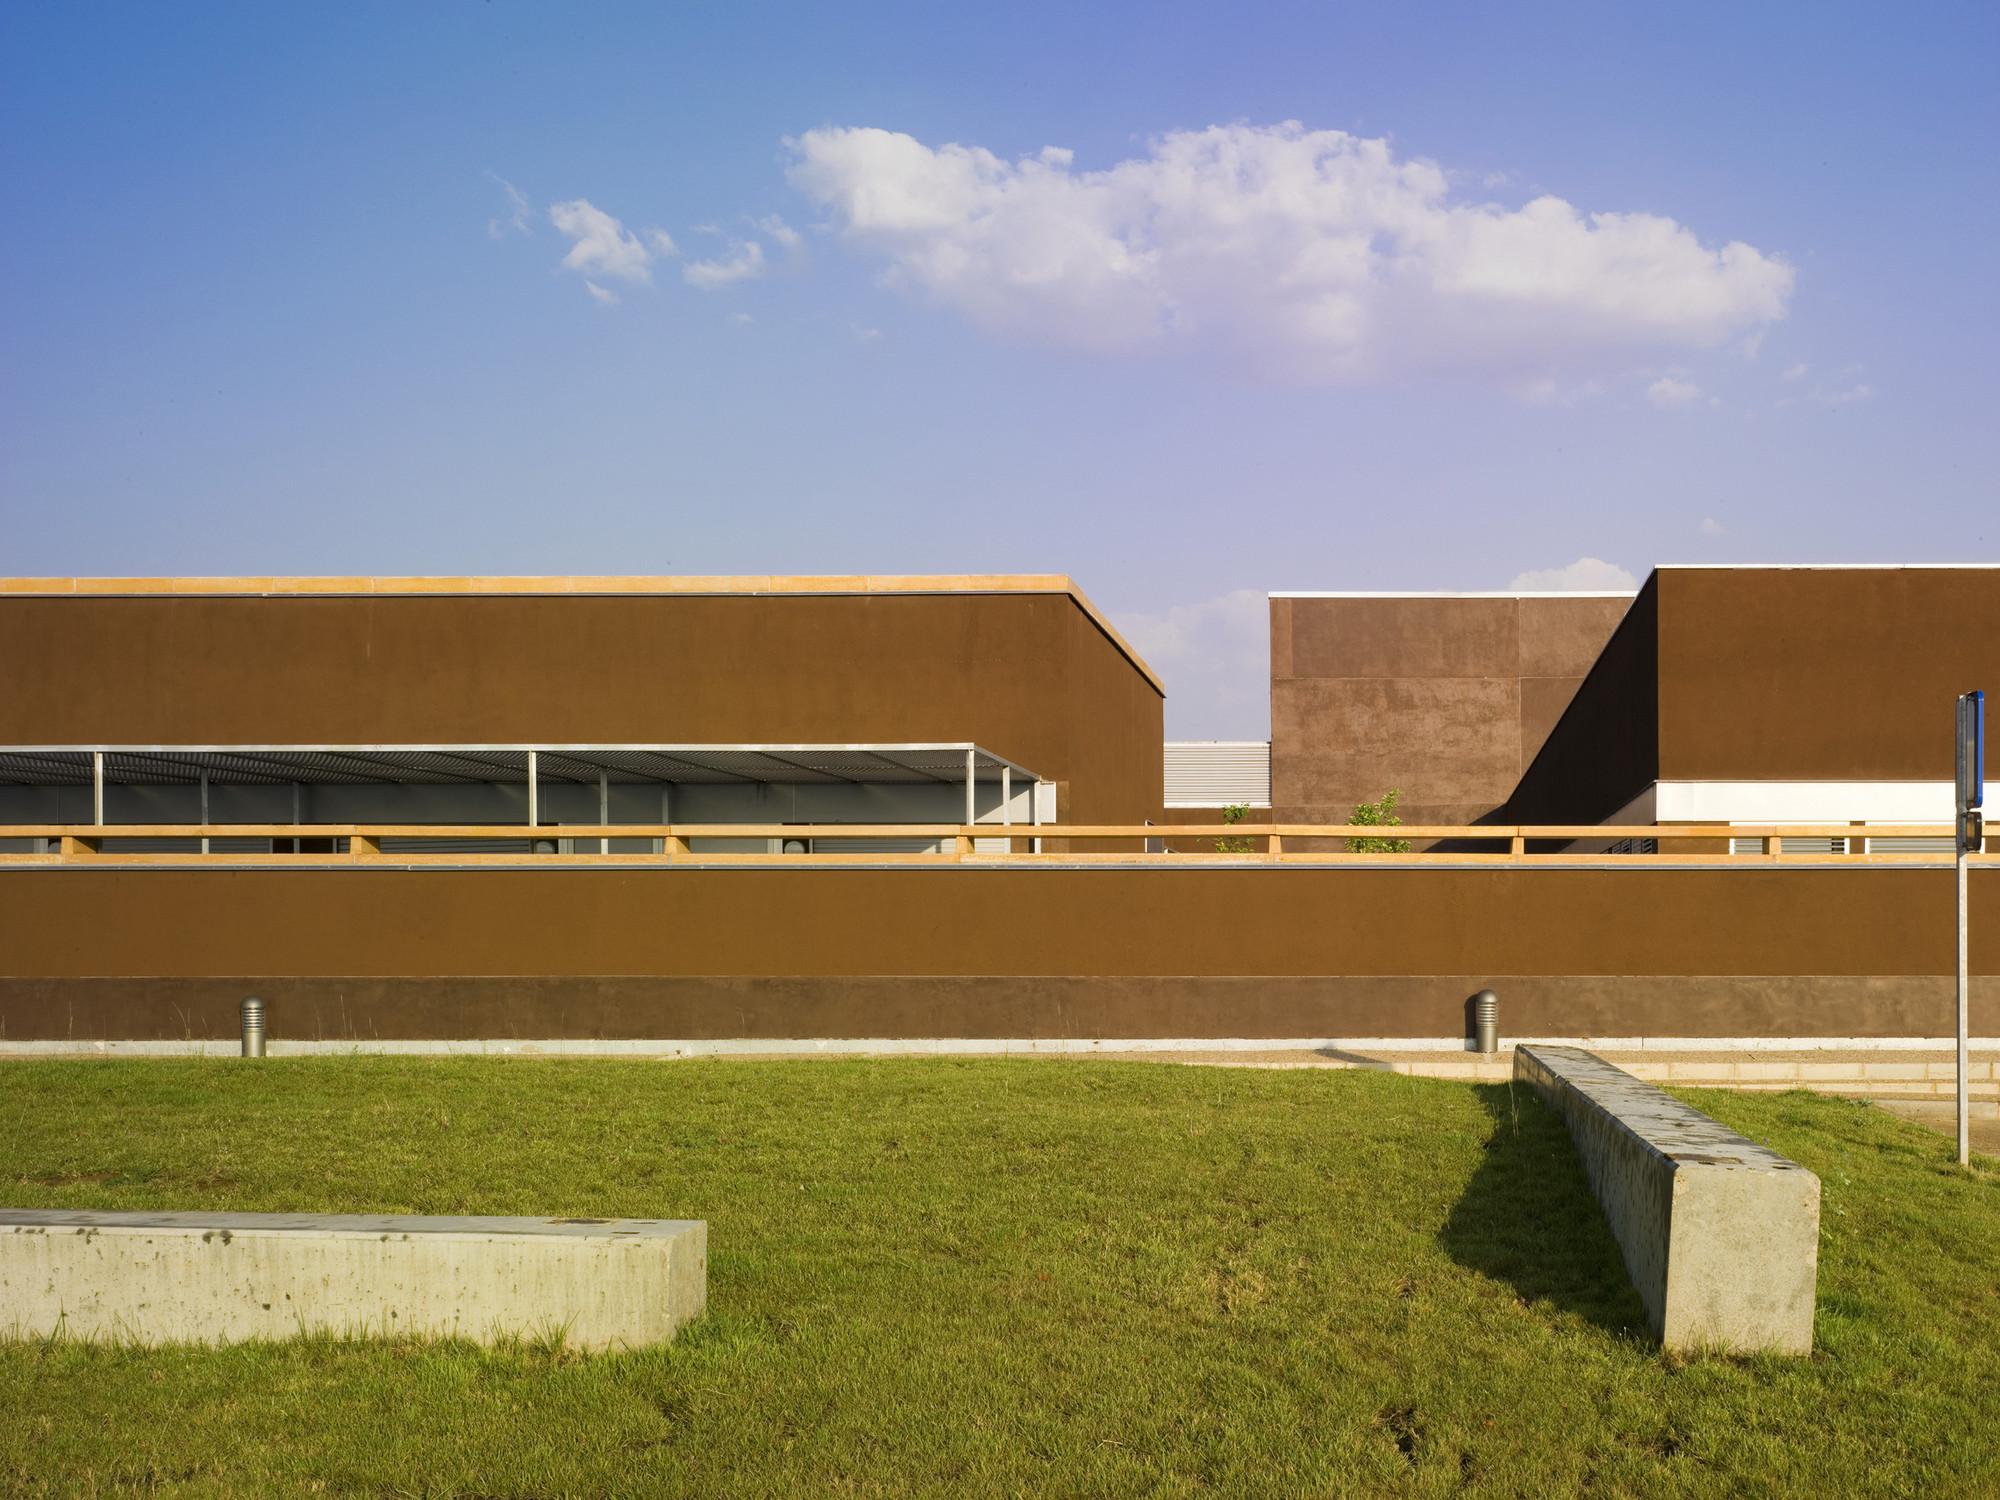 Tierra De Barros Hospital / EACSN + Junquera Arquitectos